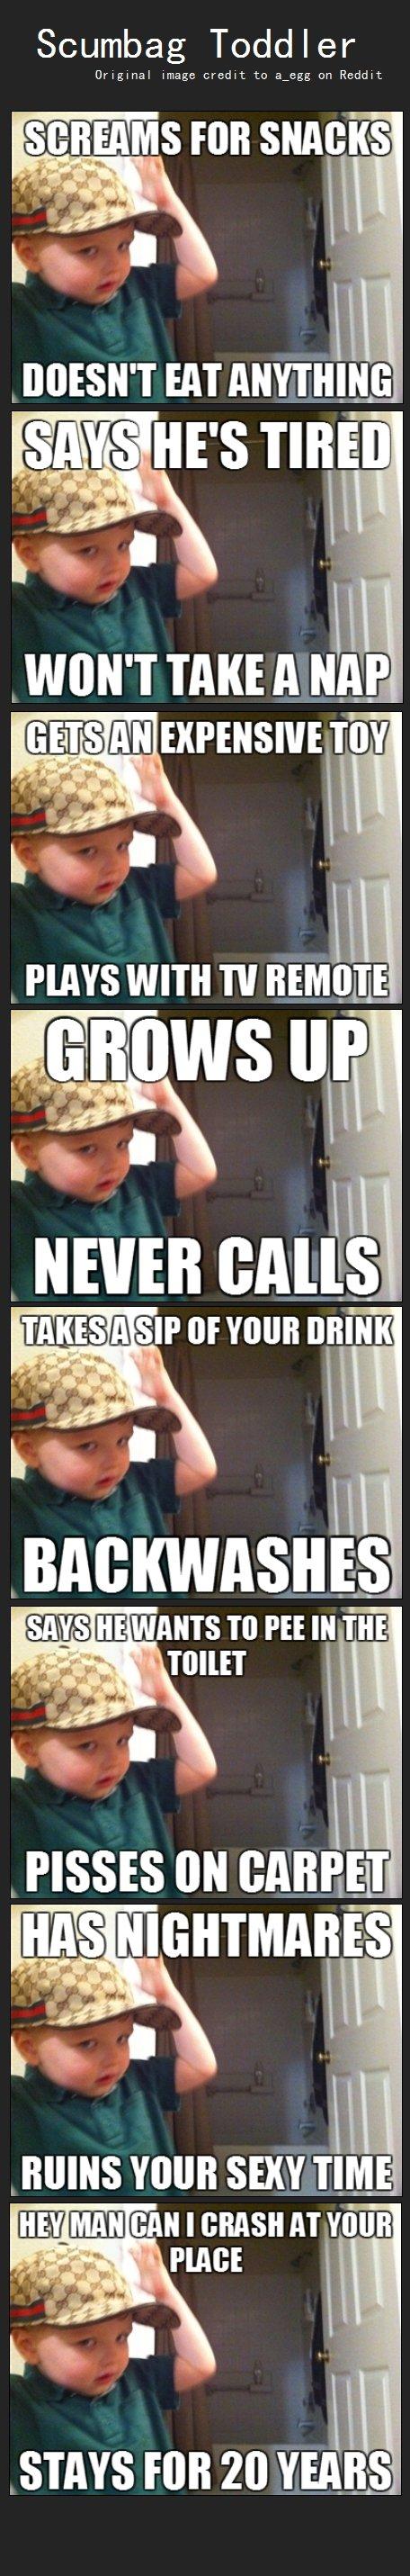 Scumbag Toddler Comp. Here is the original imagine, for your memeing pleasure. i.imgur.com/kEDpu.jpg enjoy! . Scumbag Toddler Foil . DOESN' T EAT saif''] illgal Scumbag steve Jr toddler meme reddit